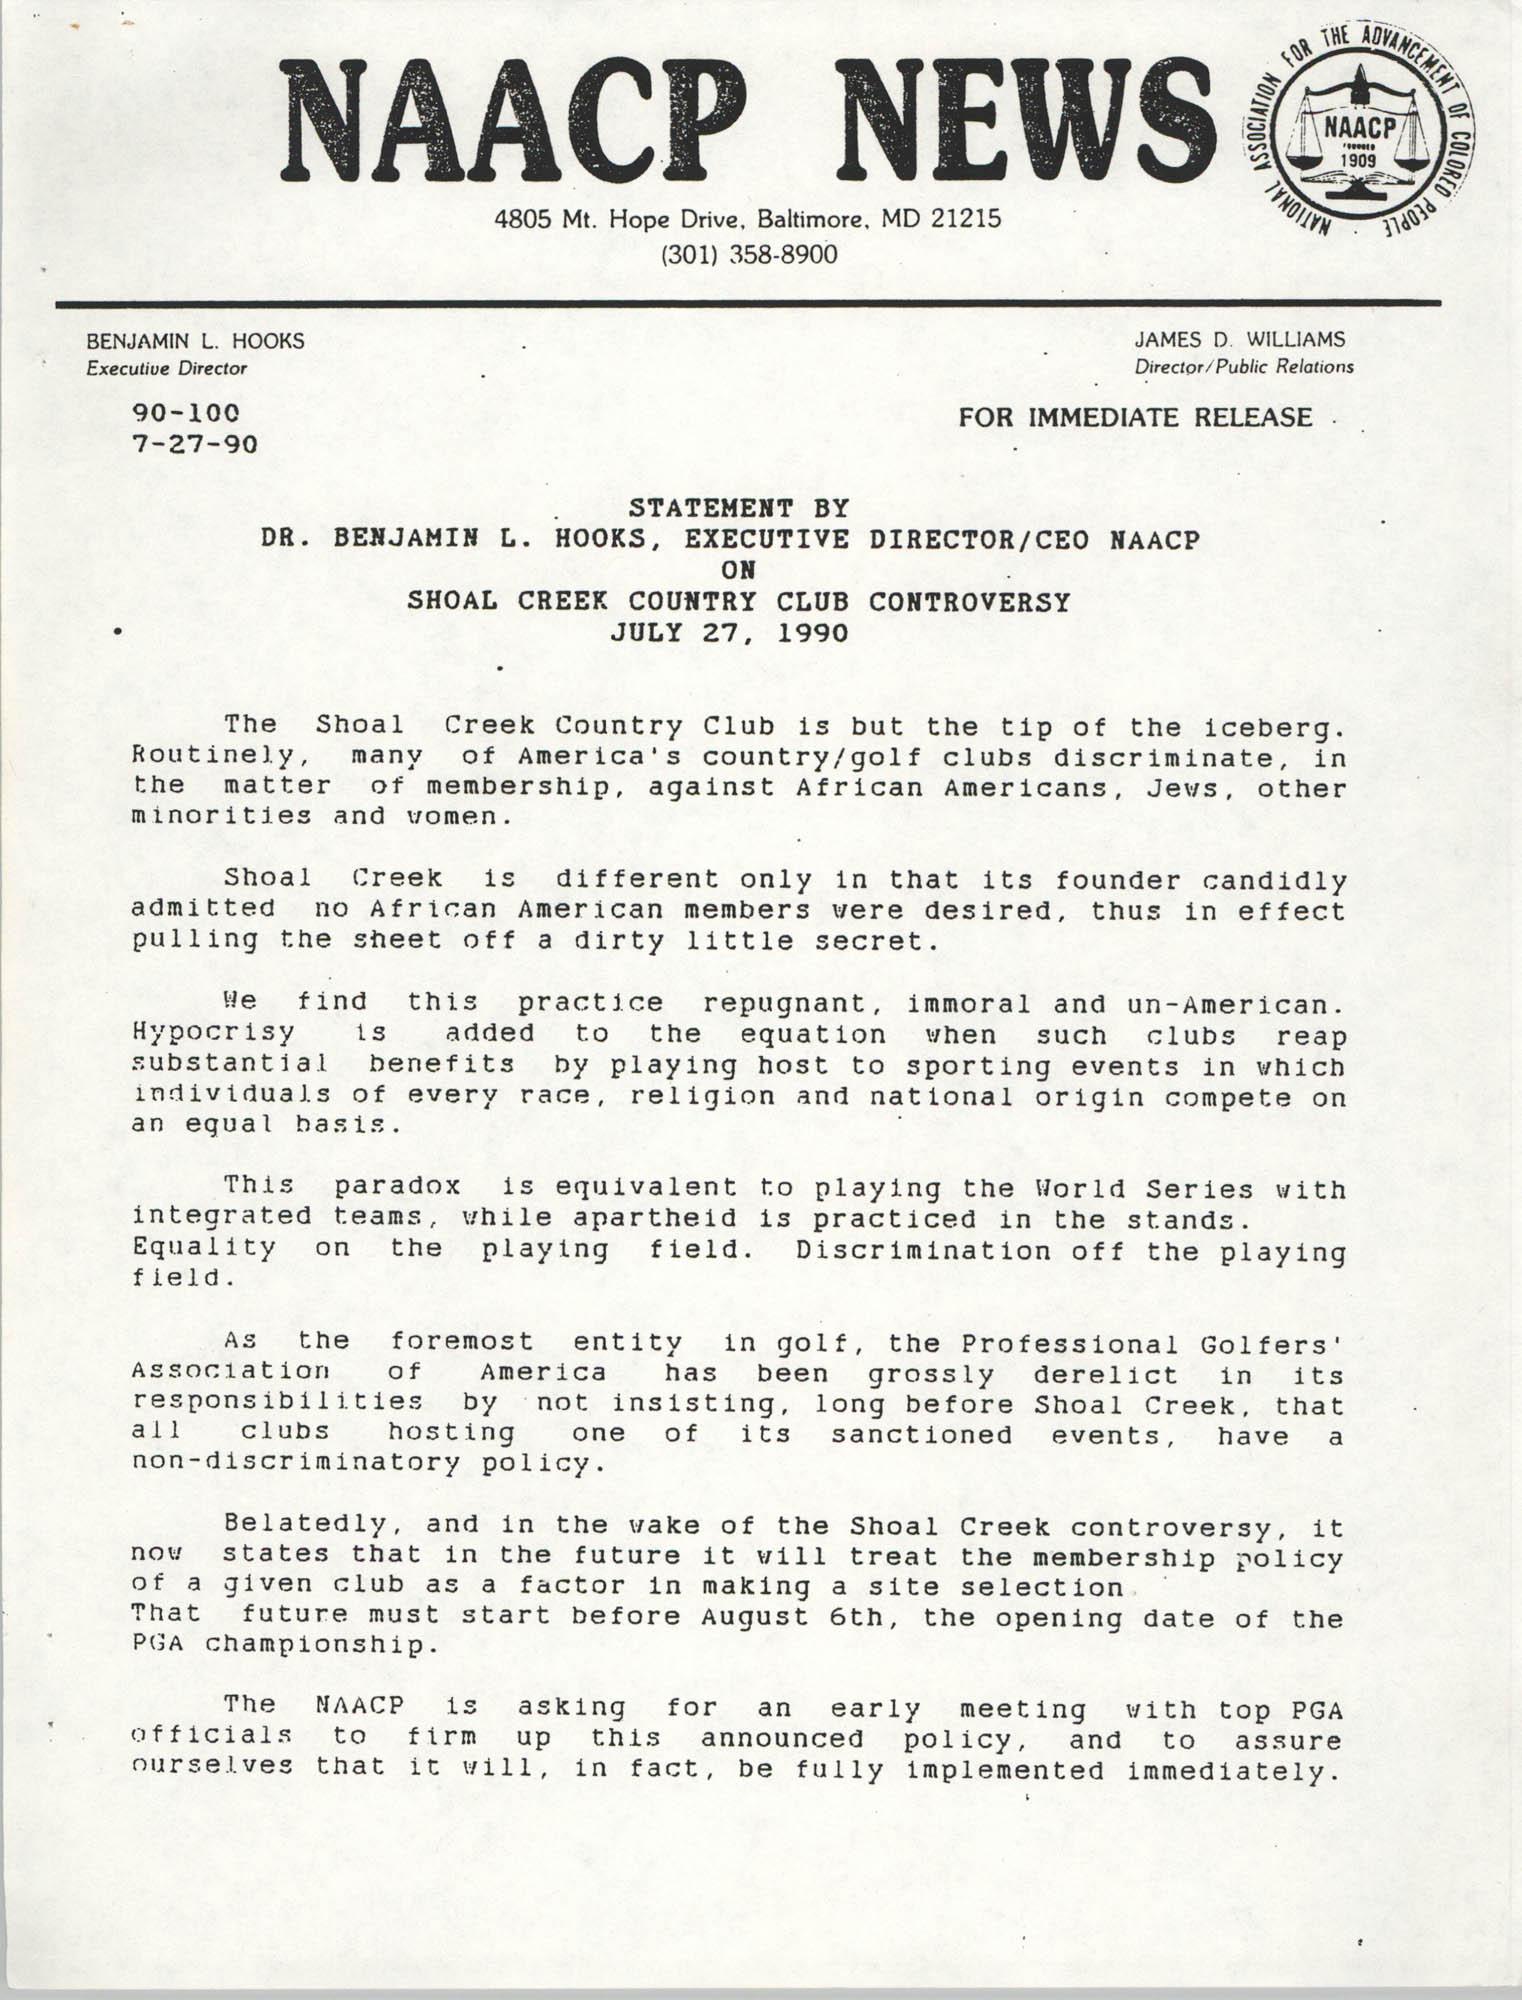 NAACP News Statement, July 27, 1990